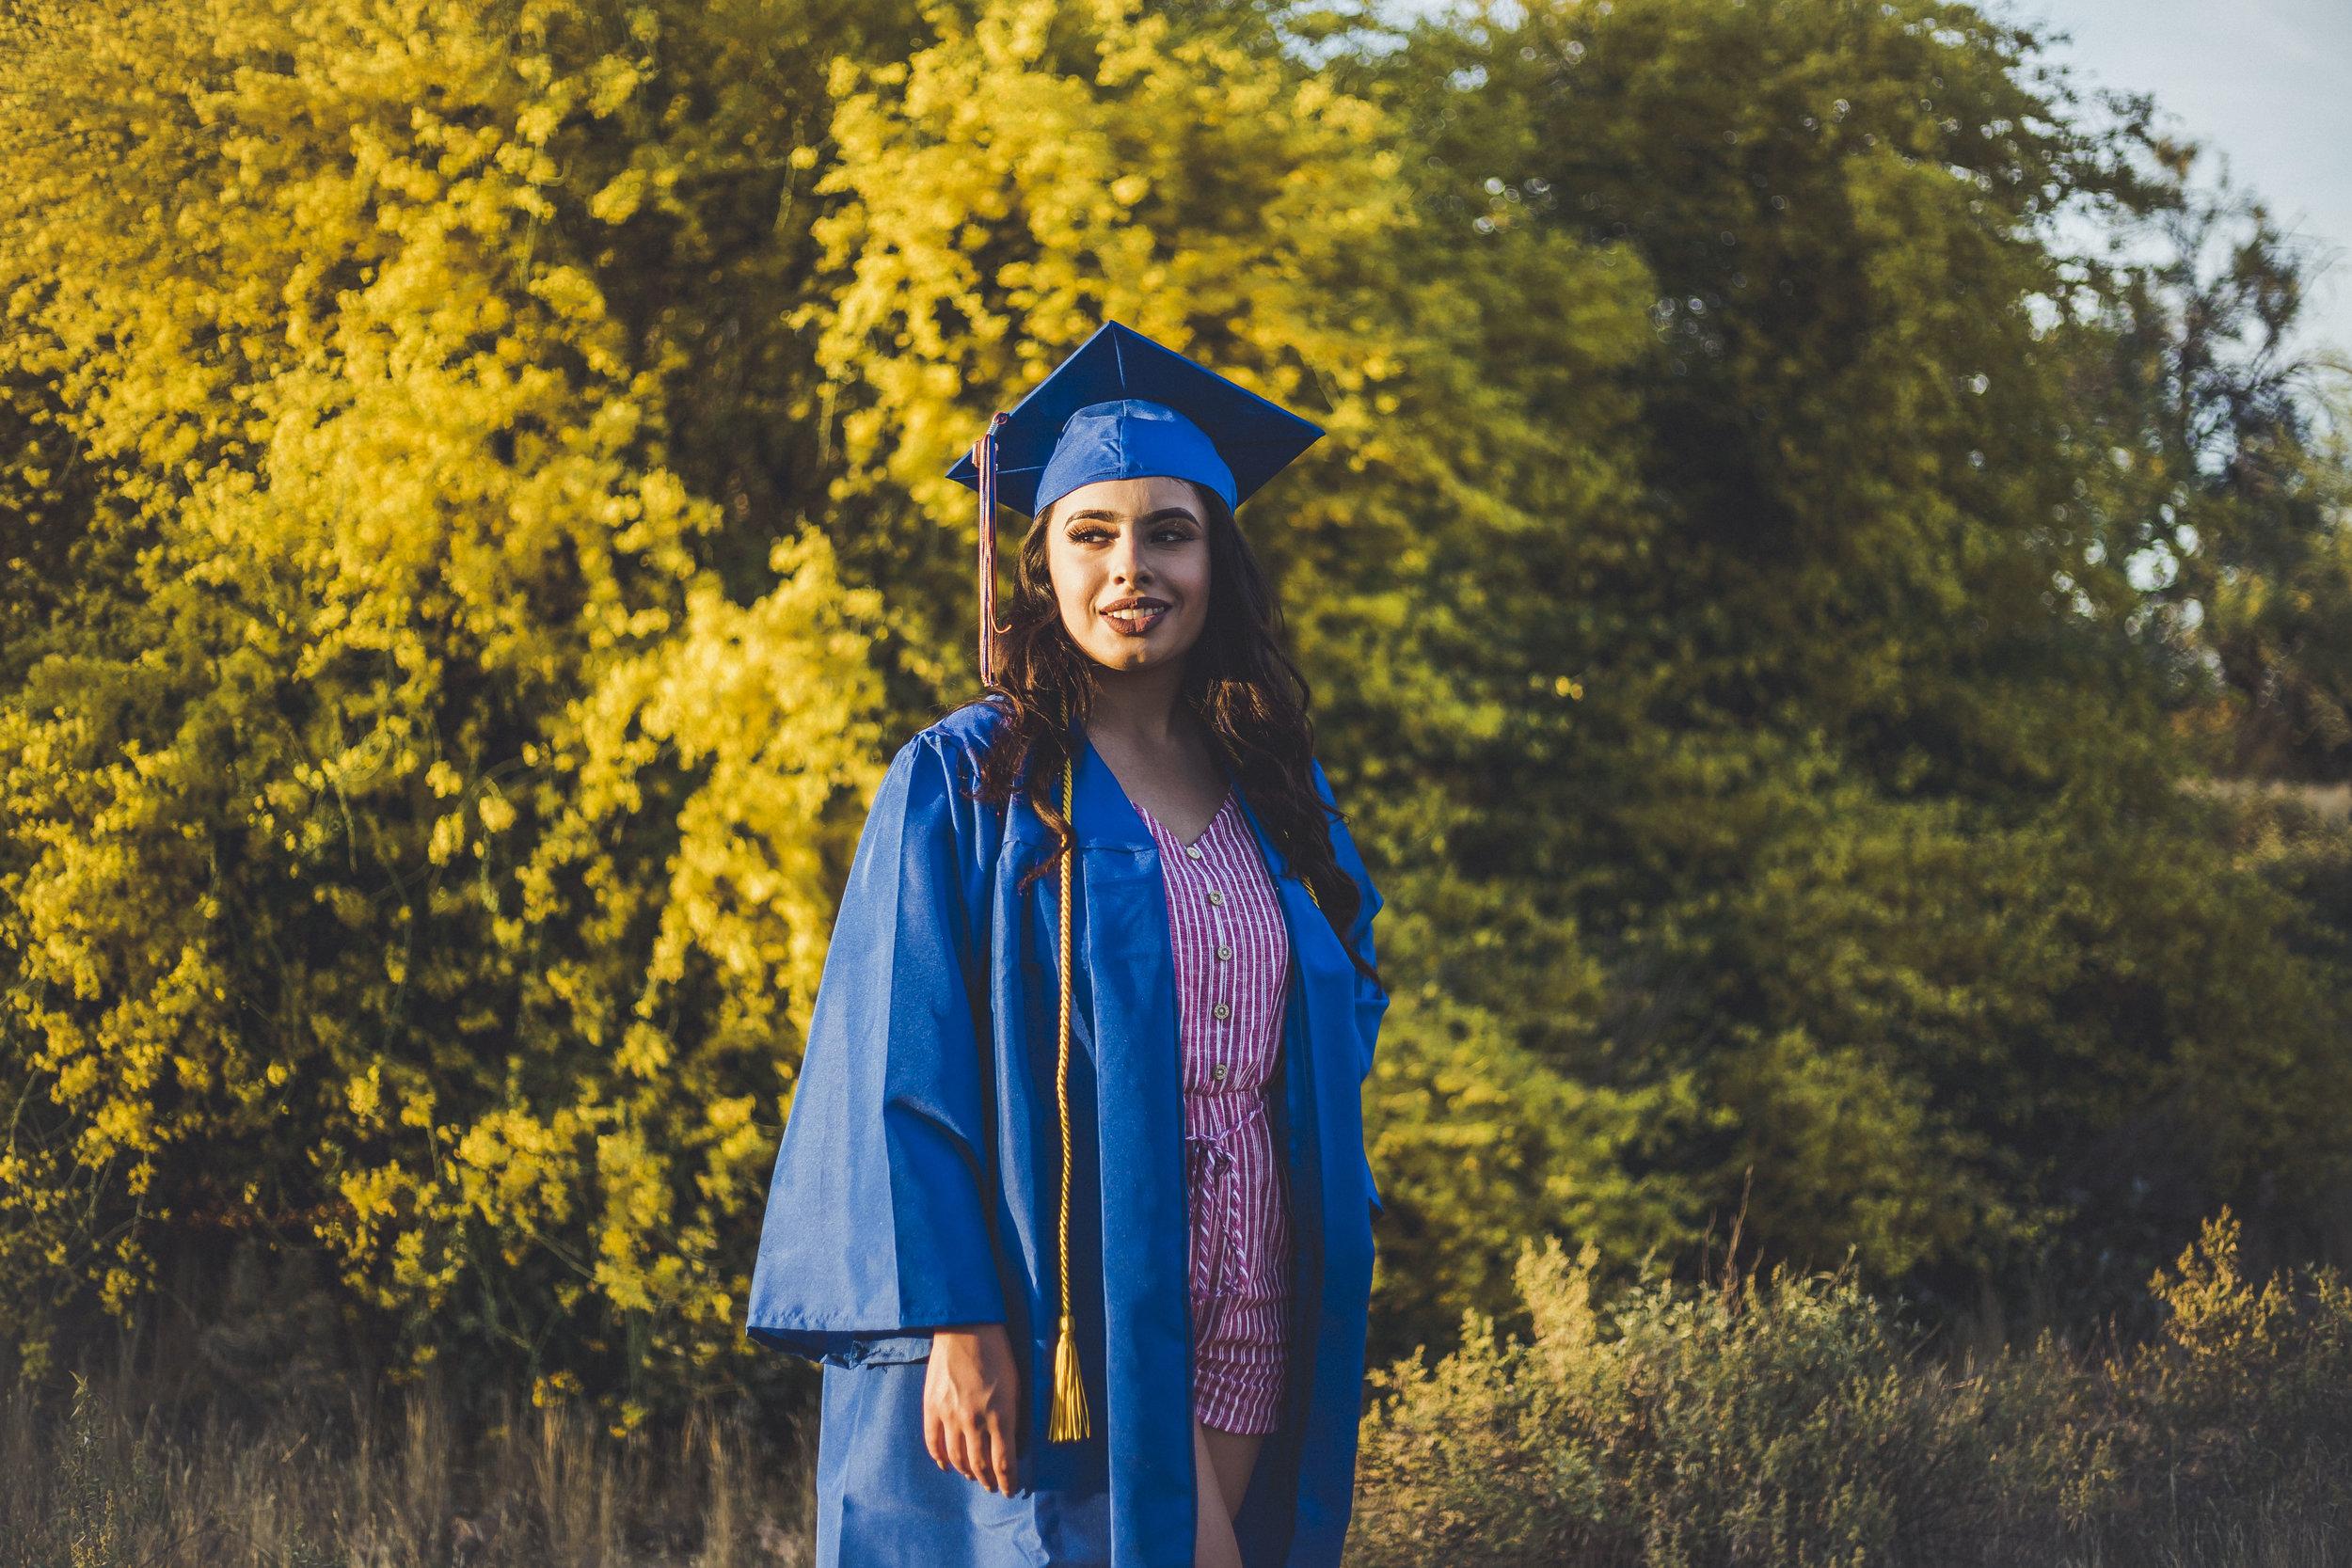 04-28-2019 Senior Portraits - Ivette Sosa_4277.jpg